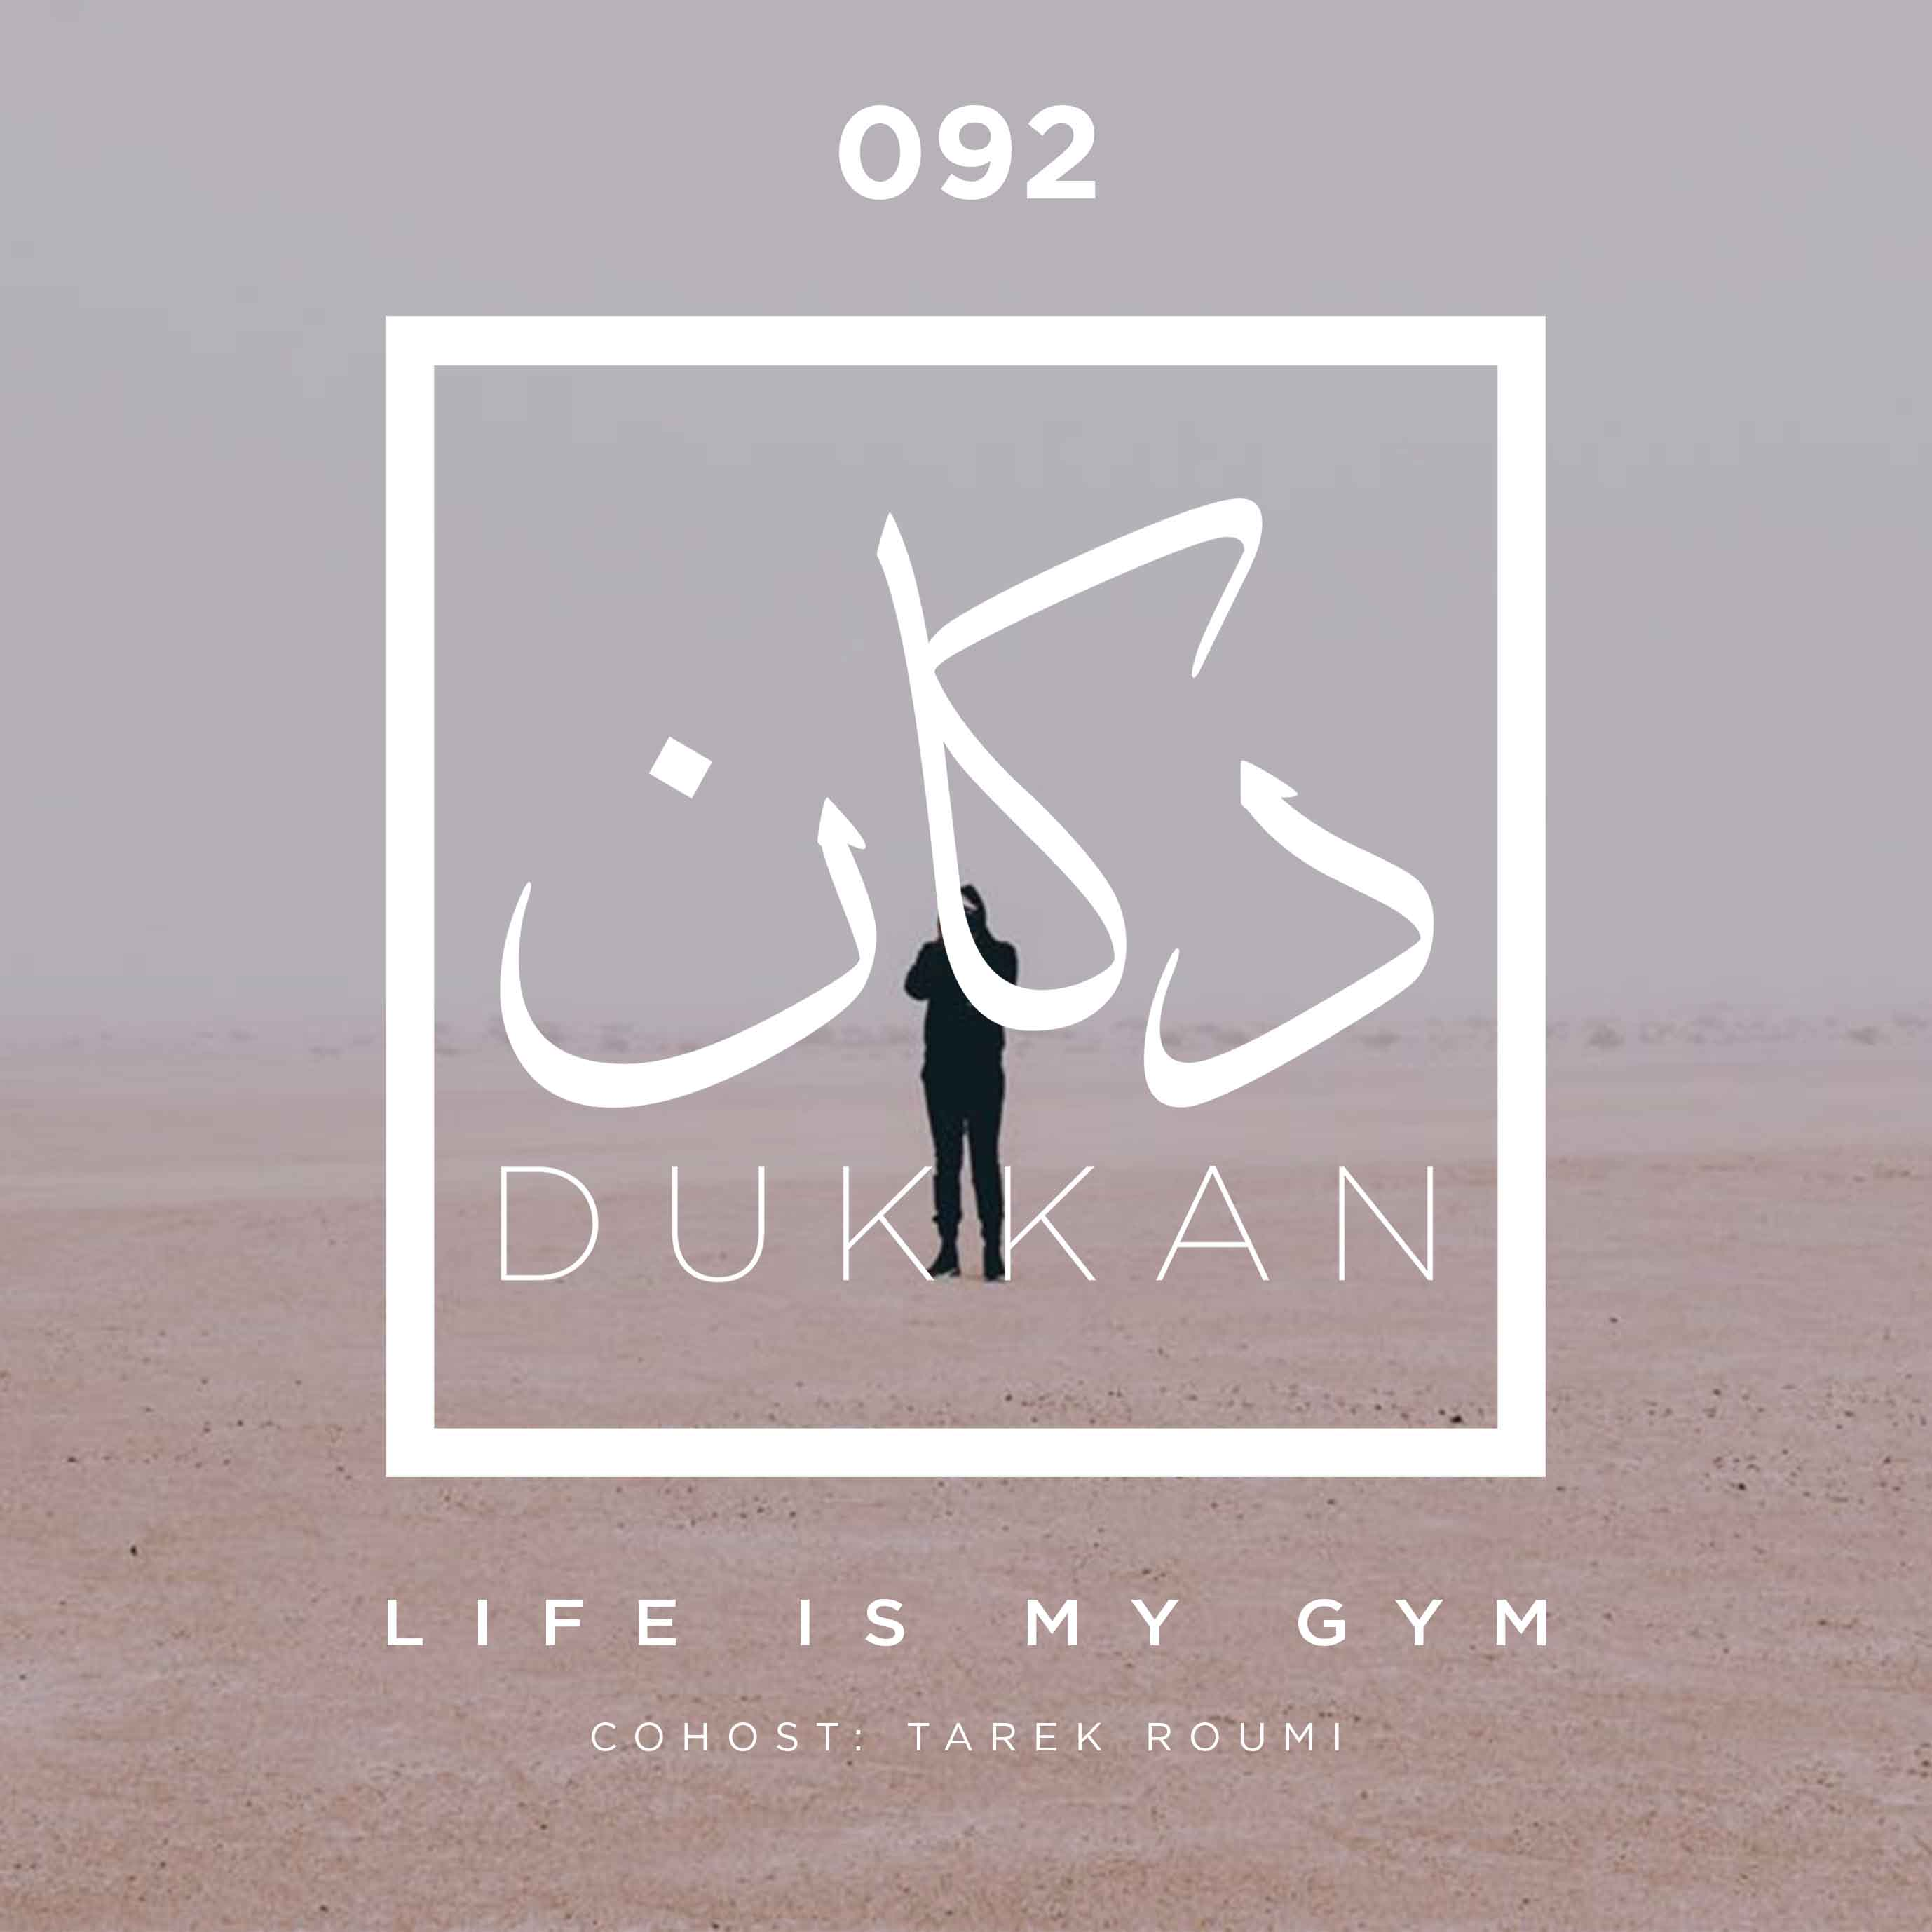 E092: Life Is My Gym (Cohost: Tarek Roumi)